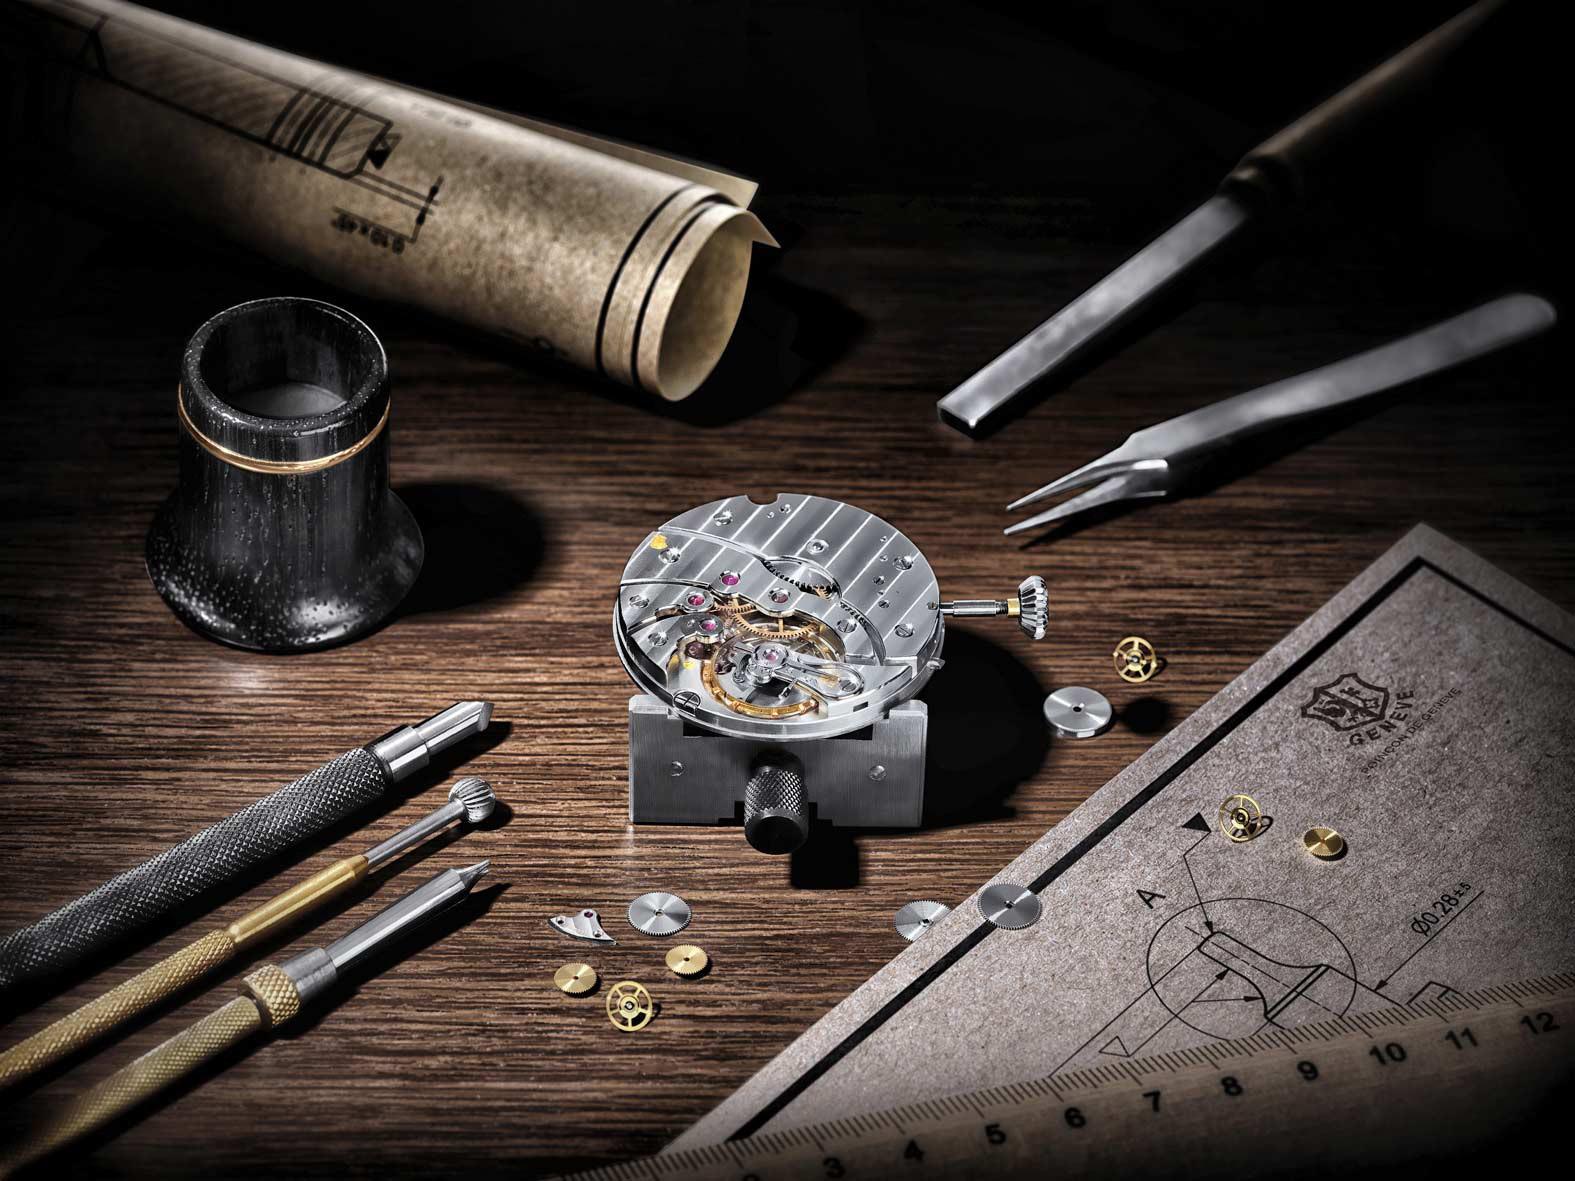 Geneva Seal - Craftmanship